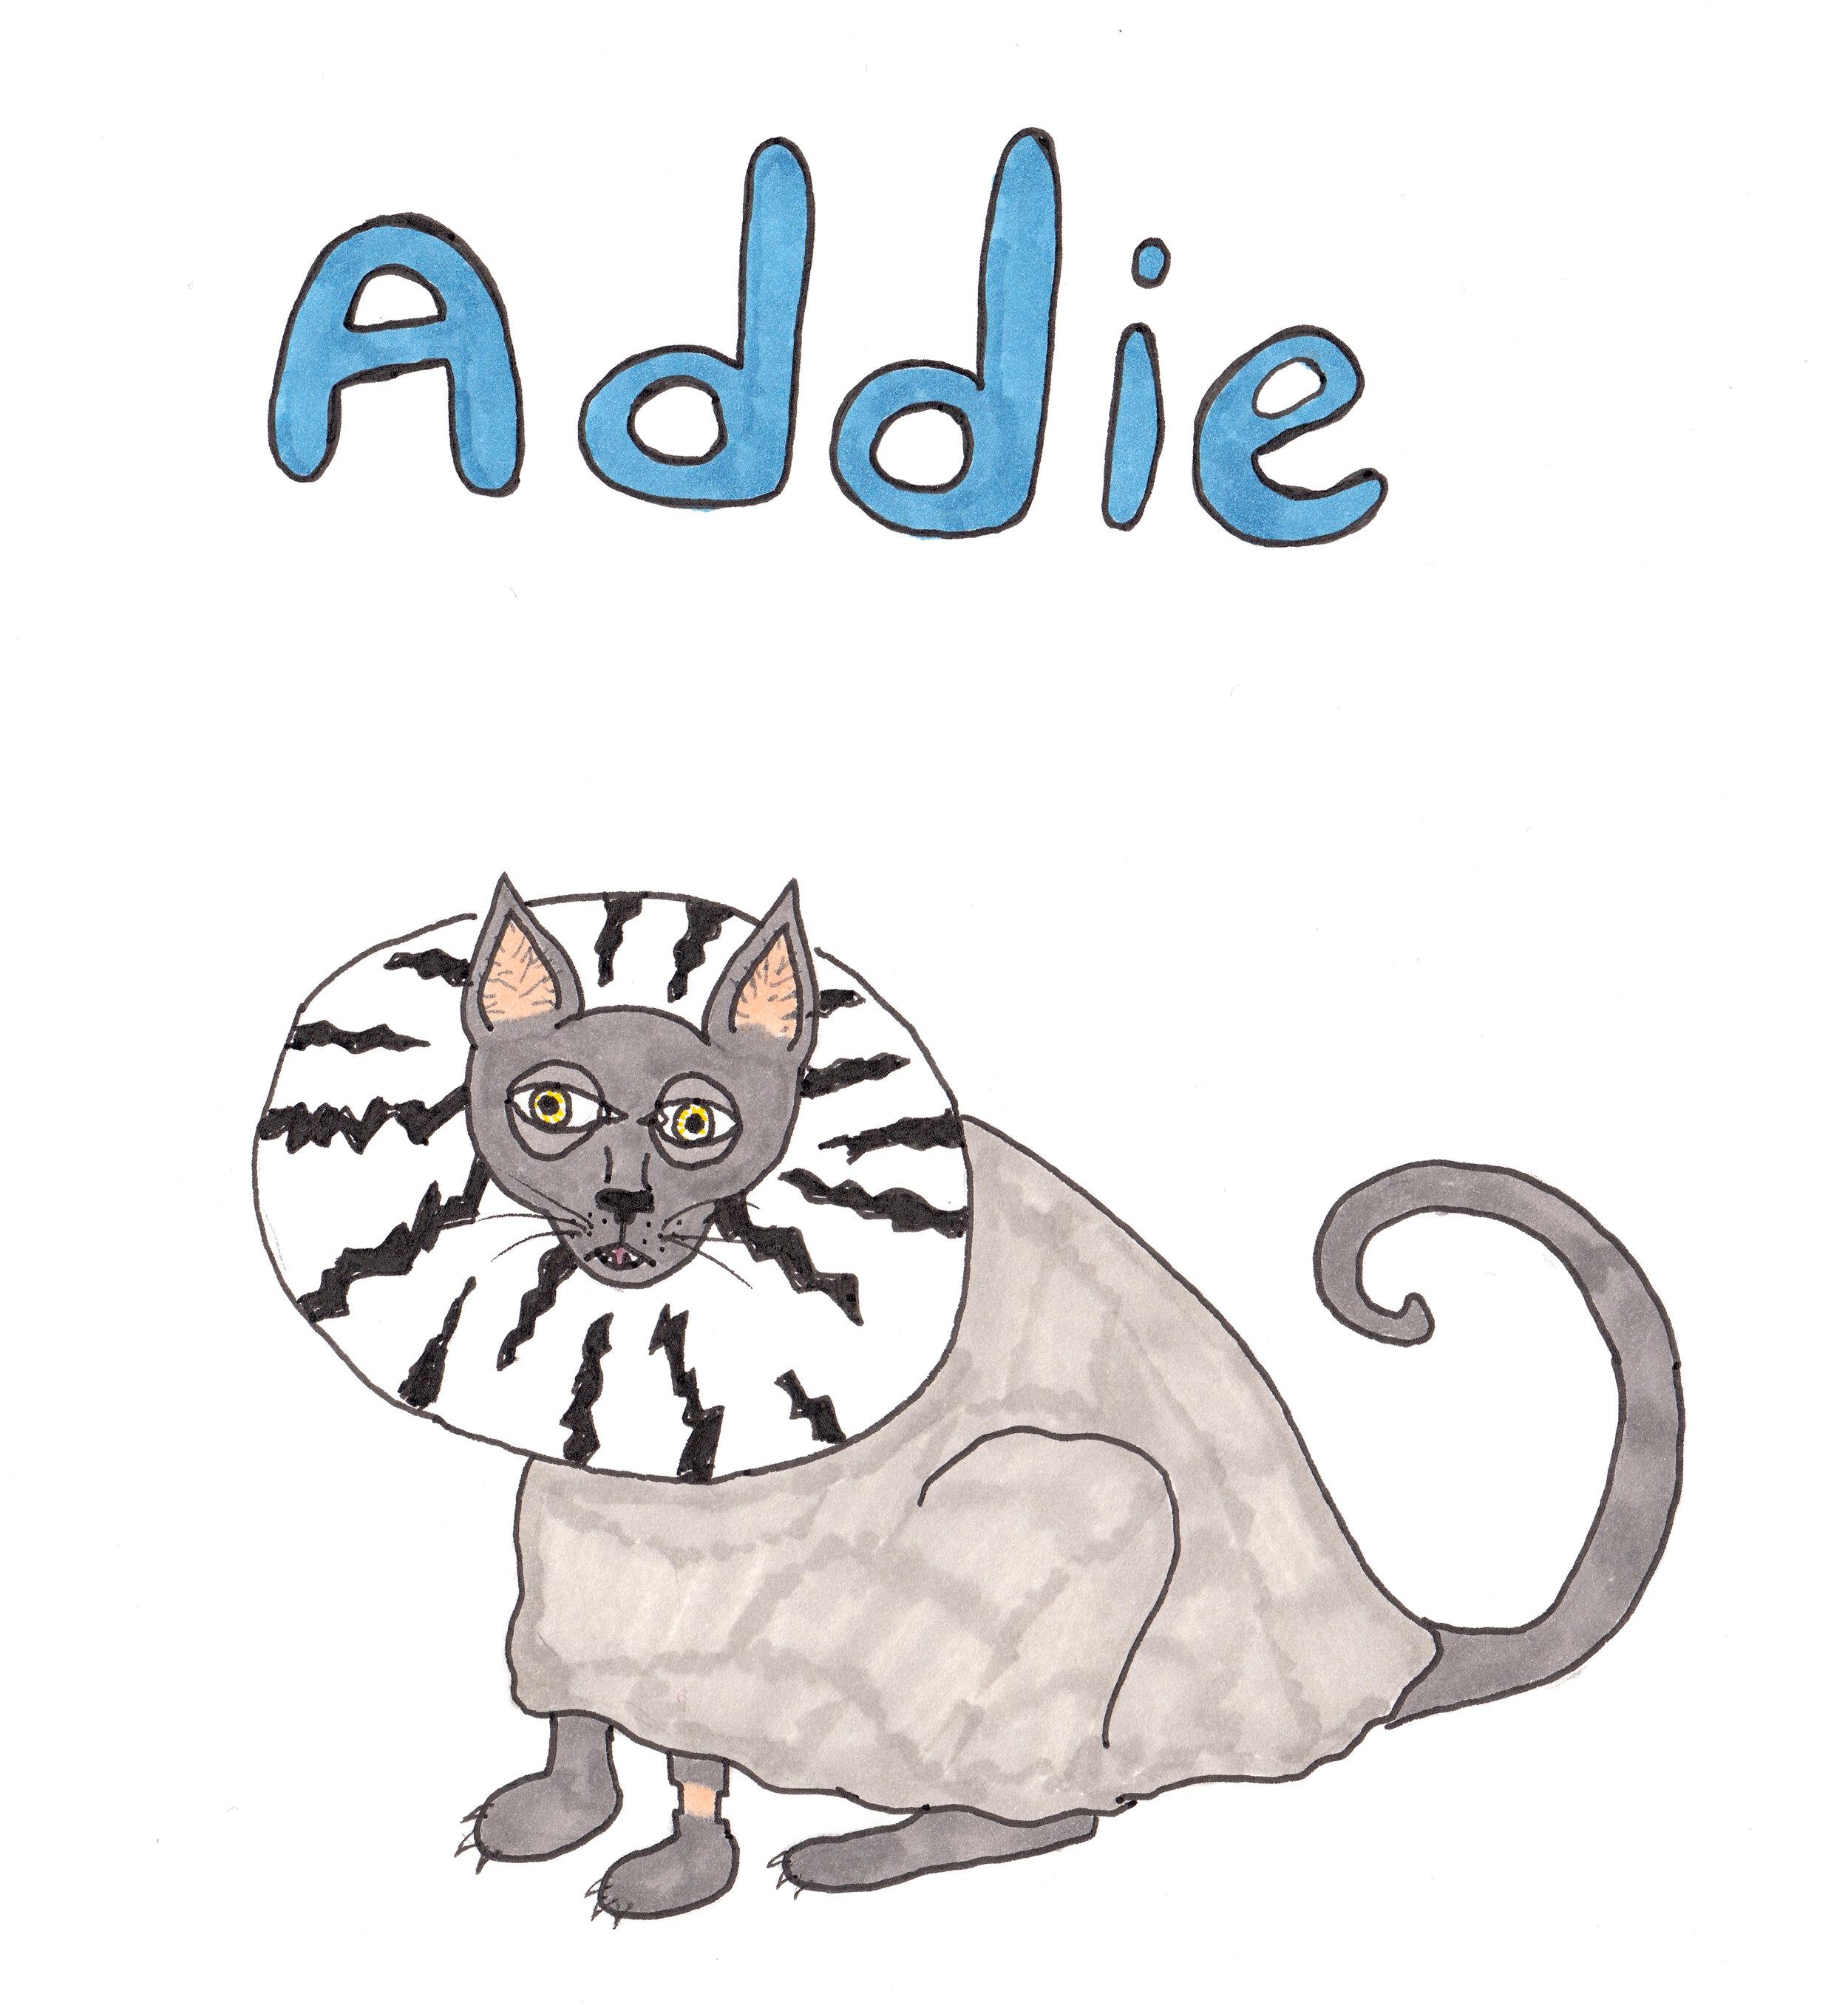 Addie the cat cropped.jpg